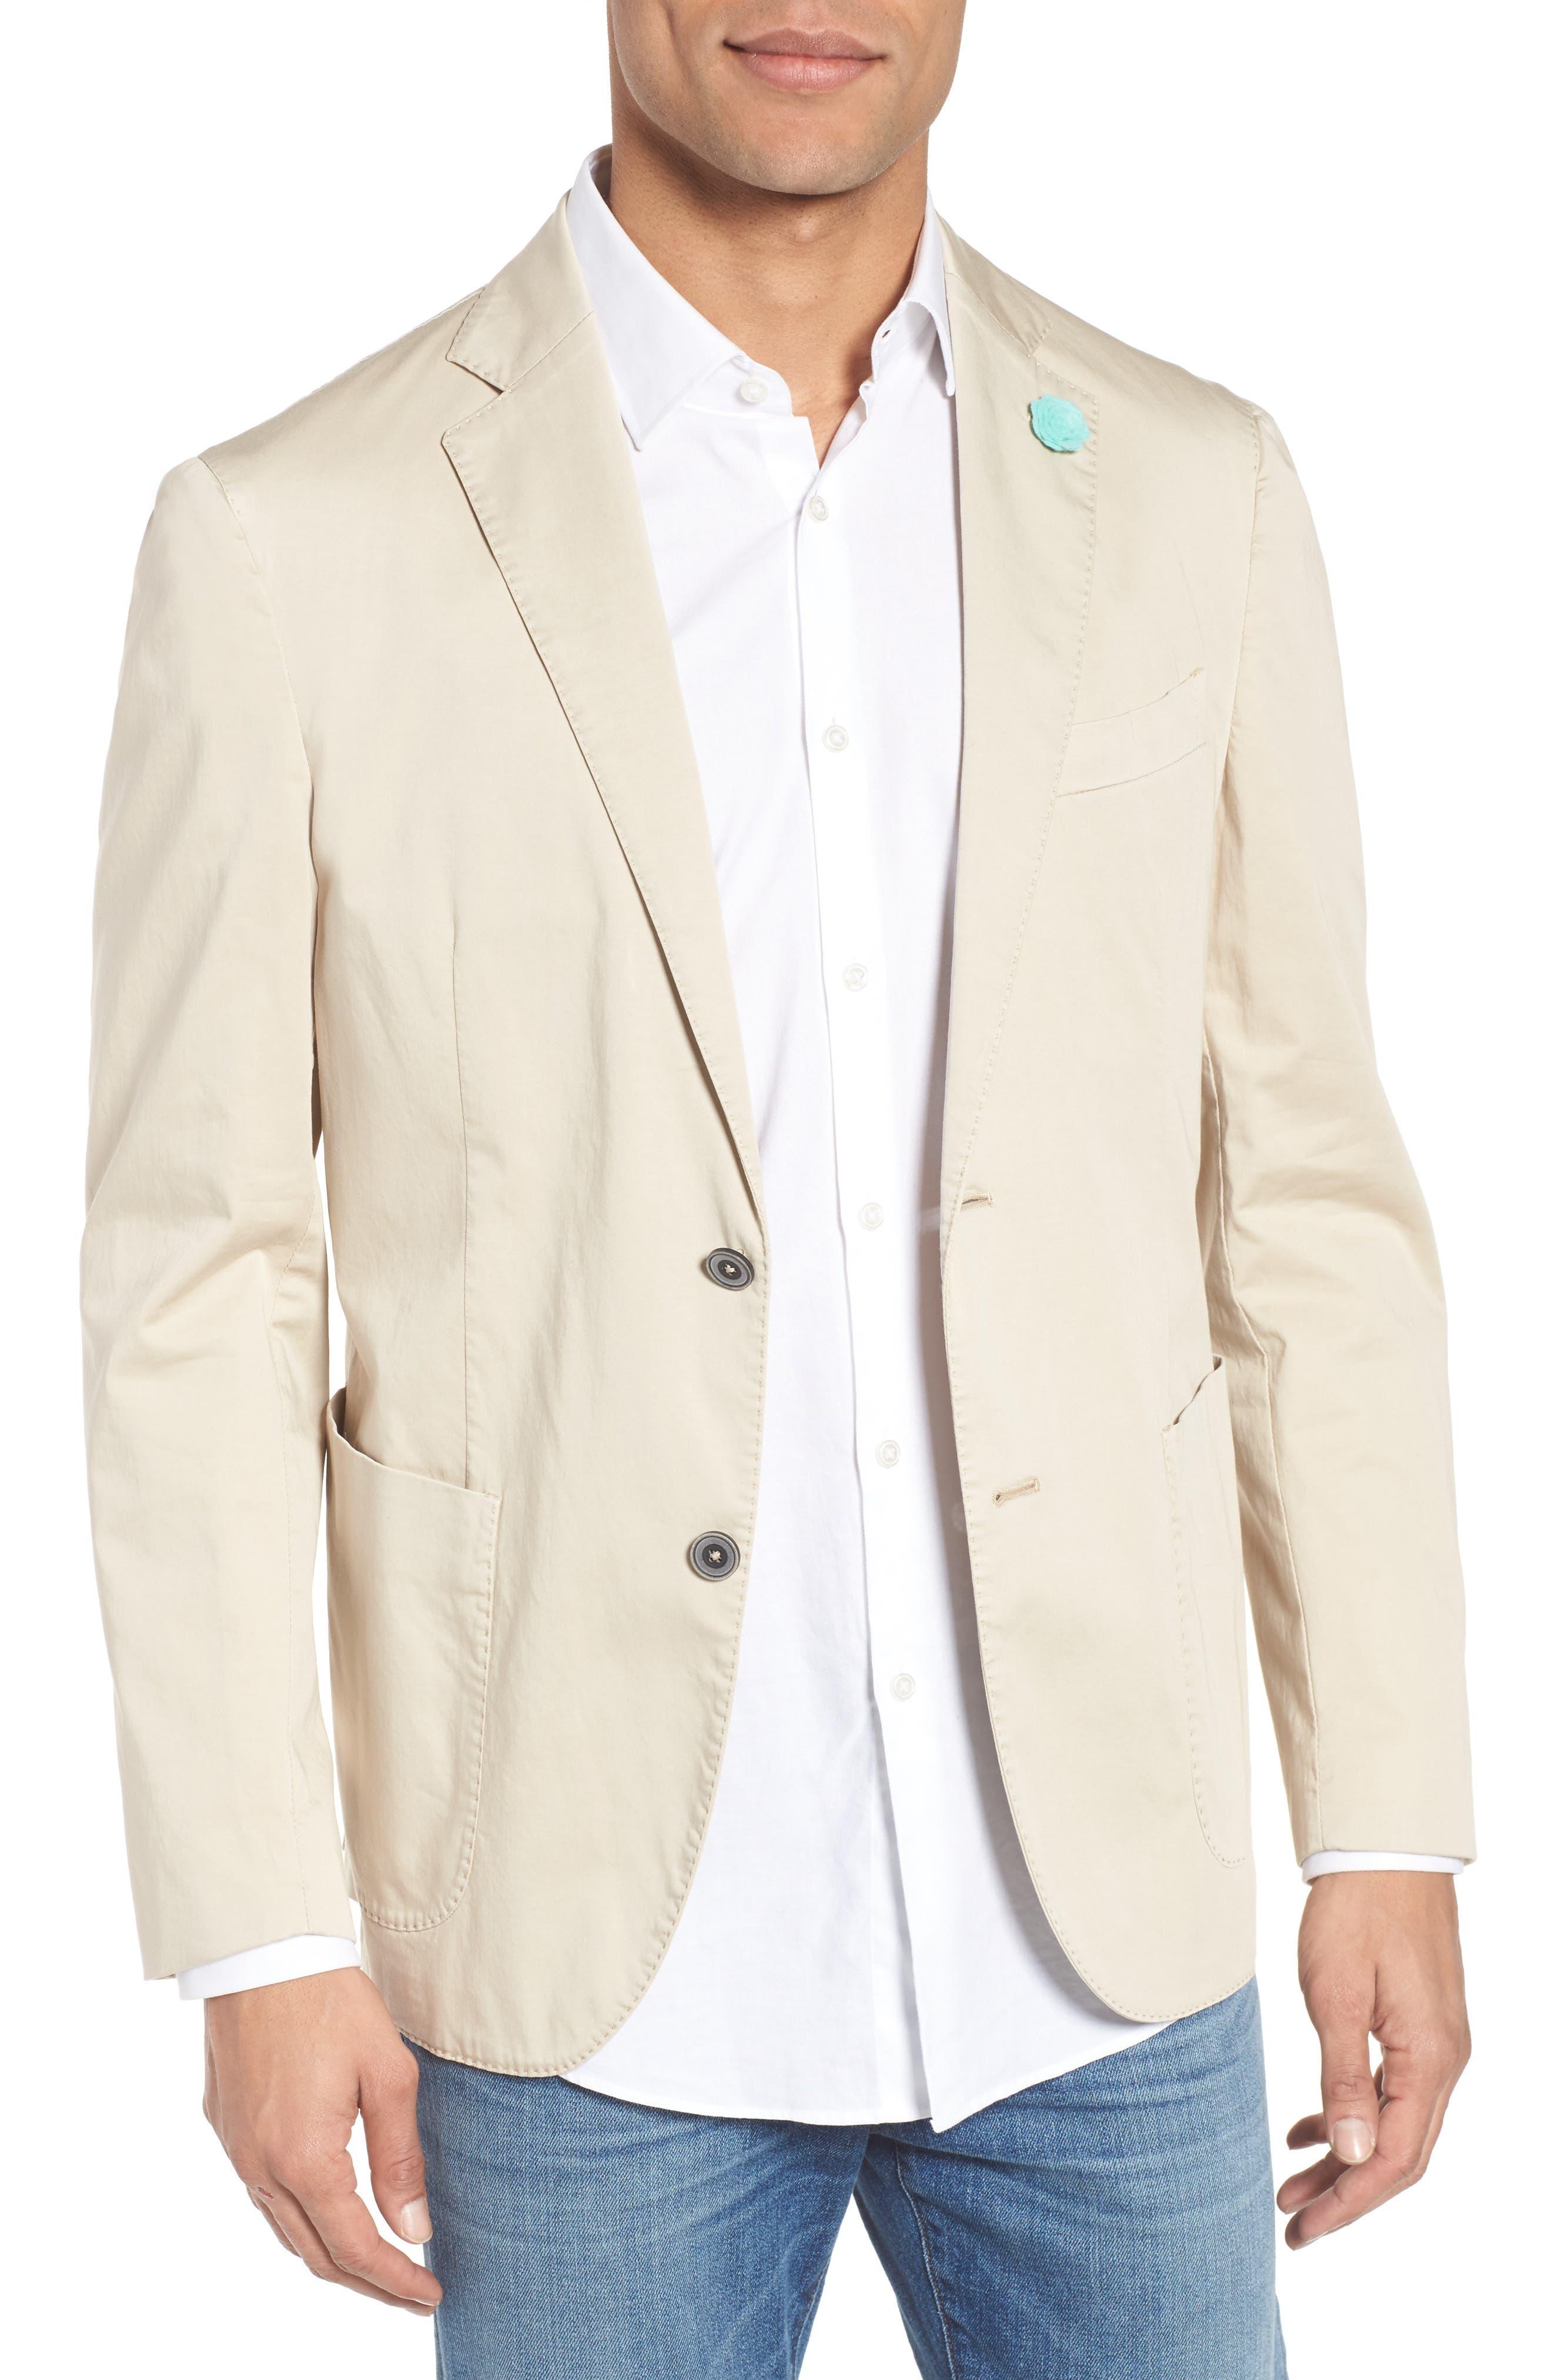 Main Image - Culturata Trim Fit Stretch Cotton Blazer